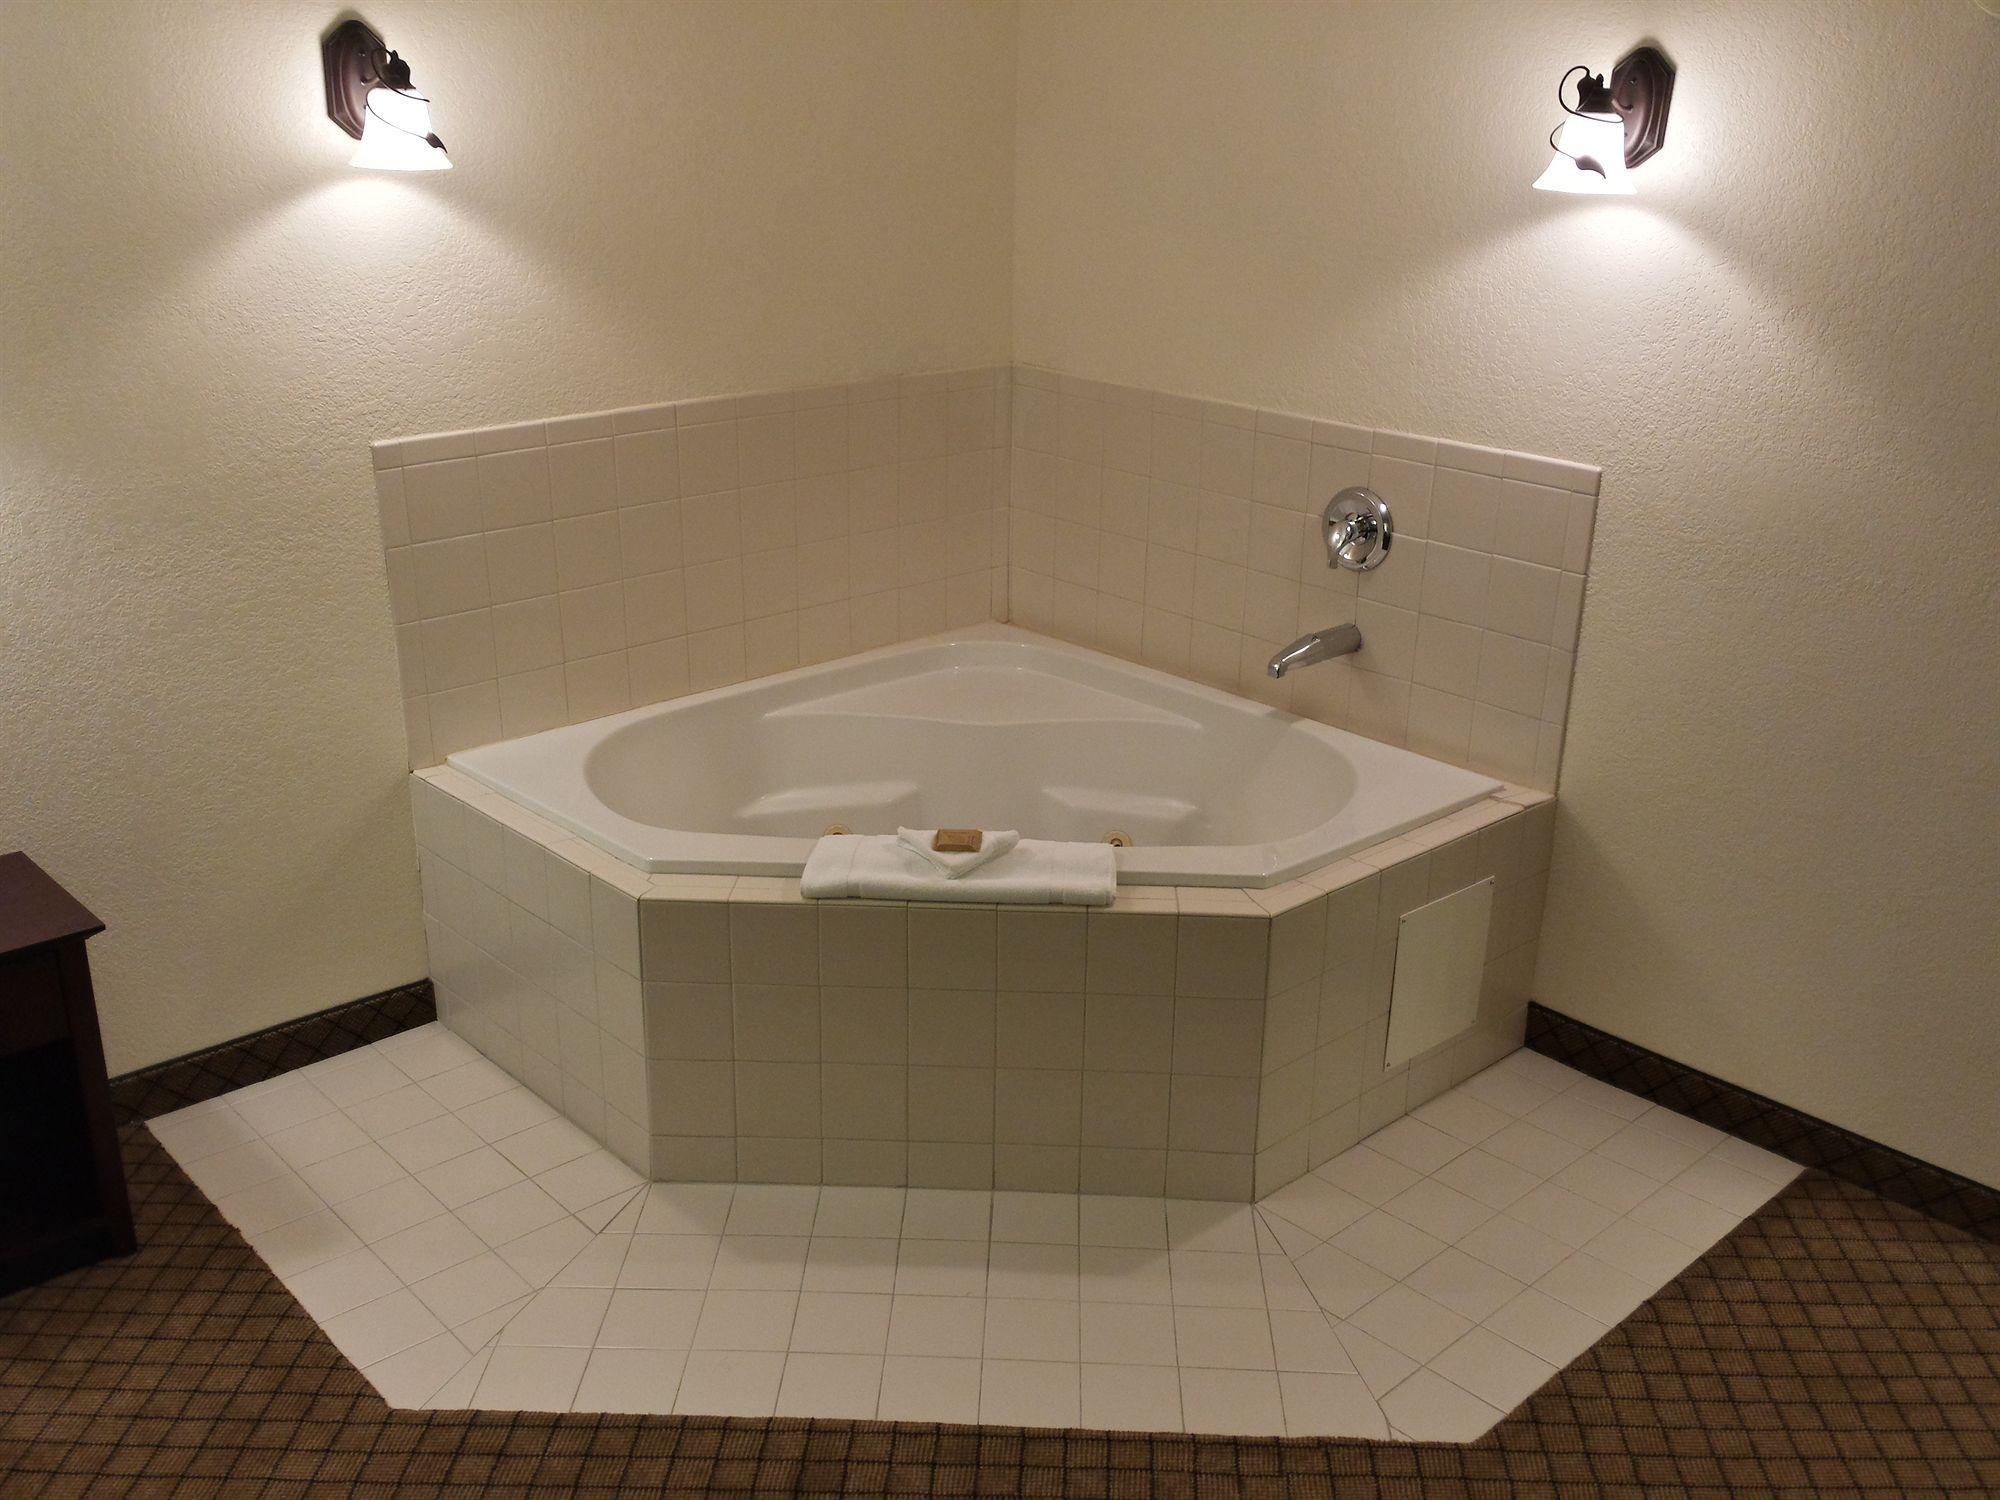 Gateway Inn & Suites in Dillard, GA